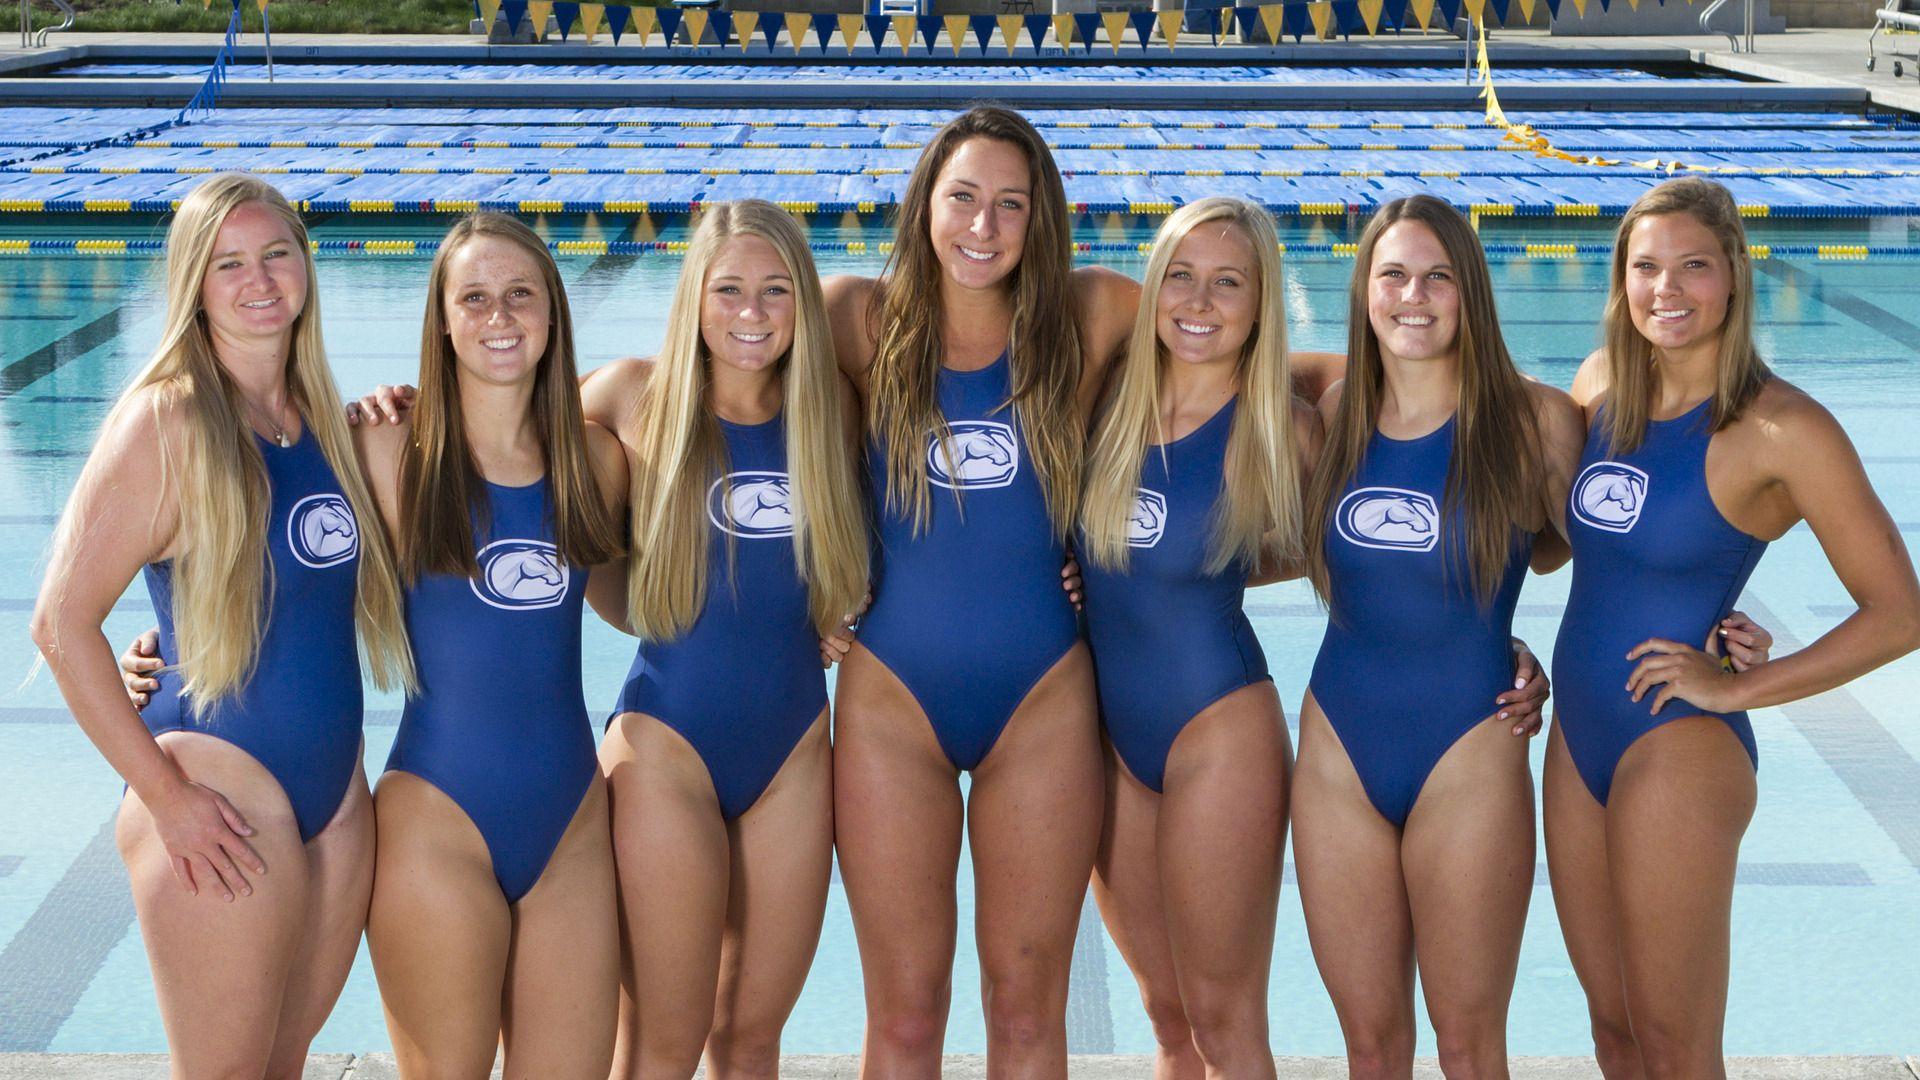 048d05585c8 UCDA WPolo Senior Day, Women's Water Polo, Swim Team, Otters, Swimsuits,